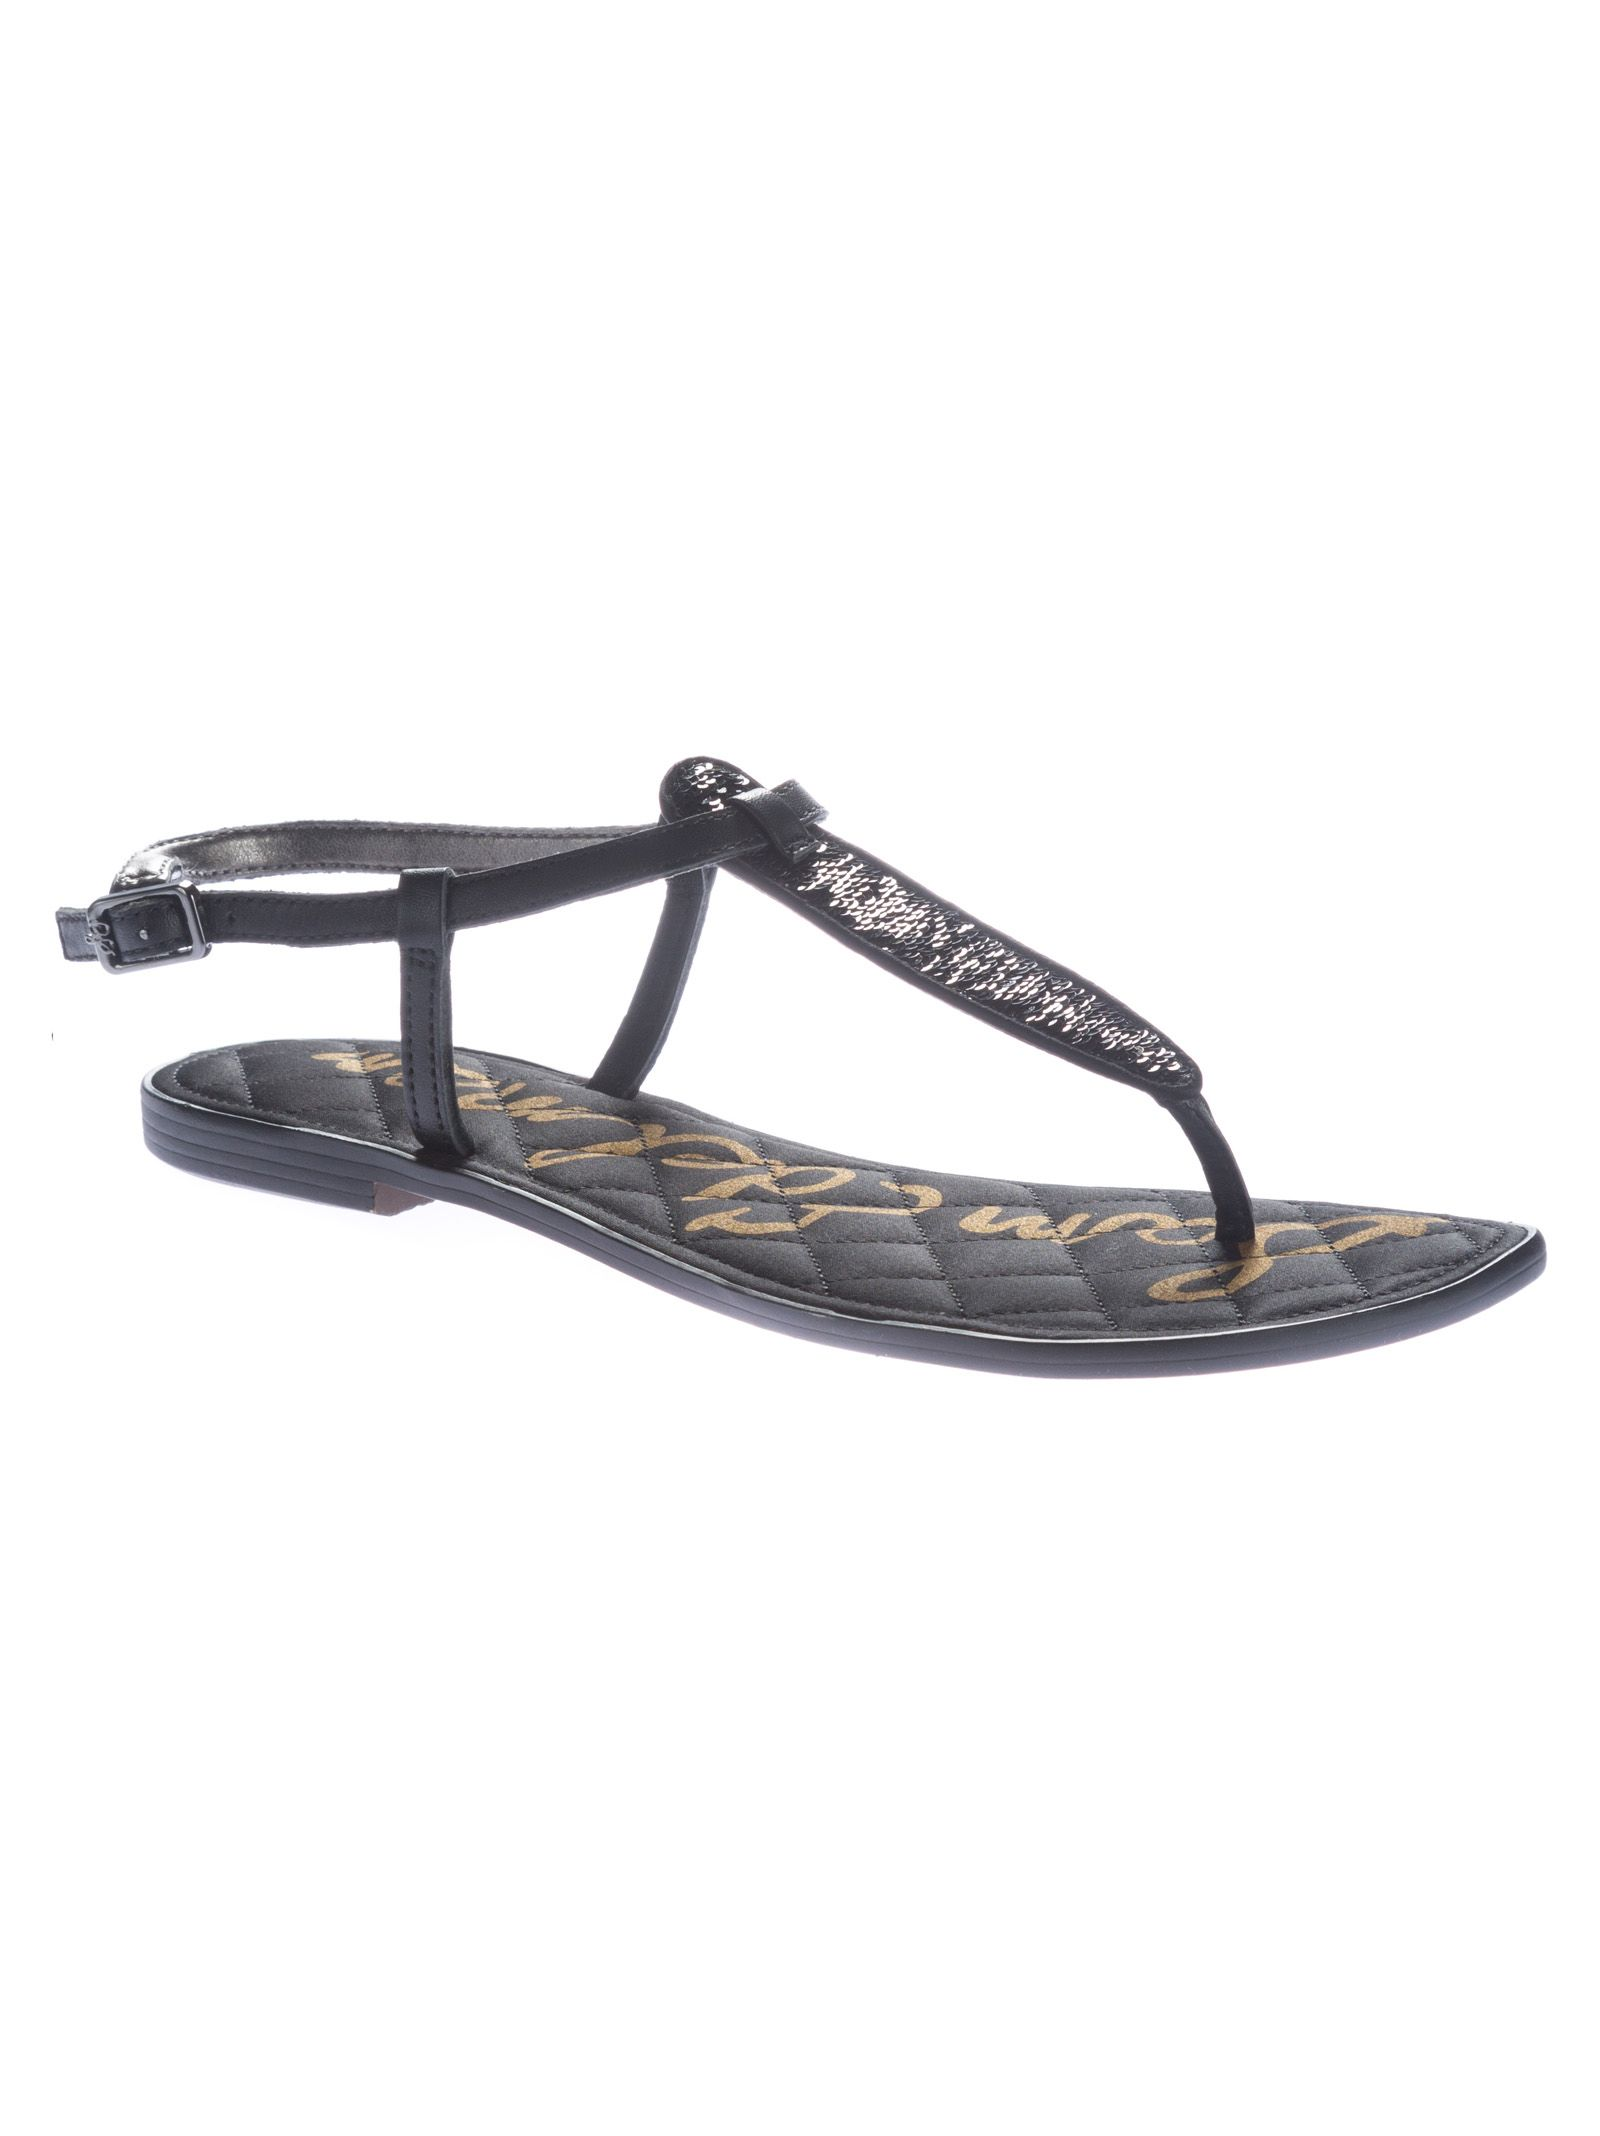 0b856900267fda Sam Edelman Sam Edelman Gigi Thong Flat Sandals - Black - 10578851 ...